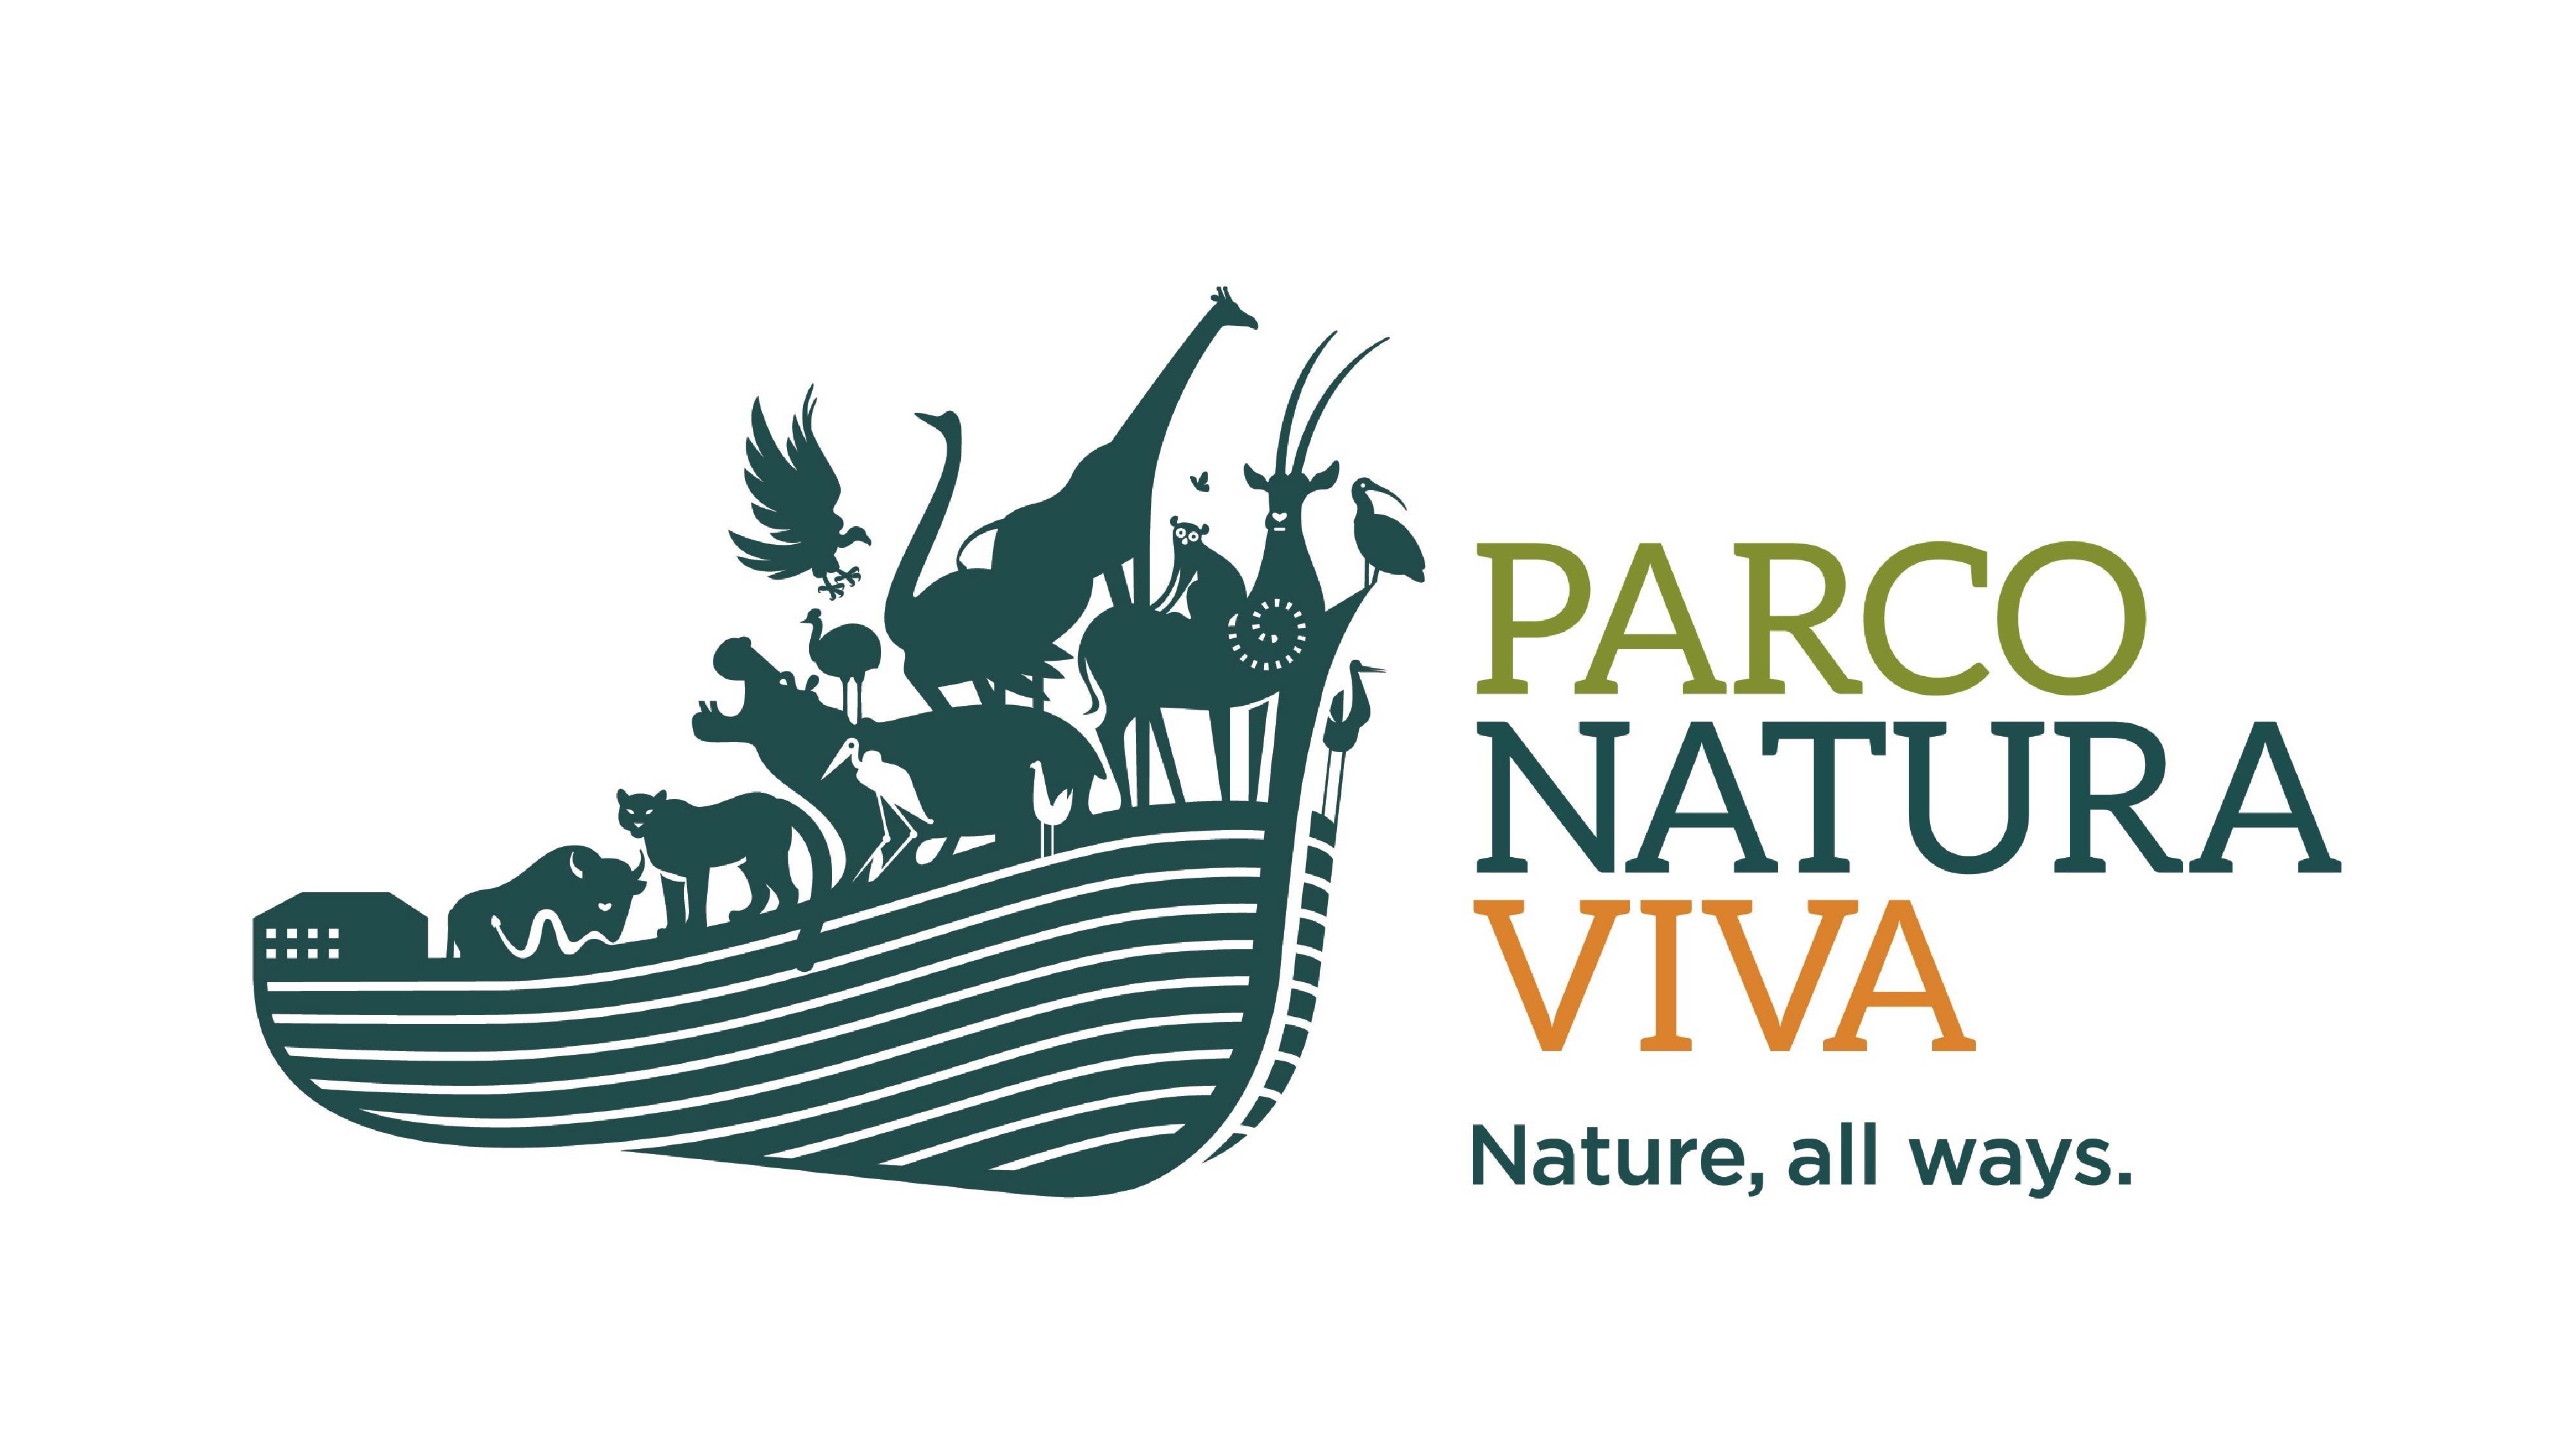 parco natura viva verona video tour - photo#31